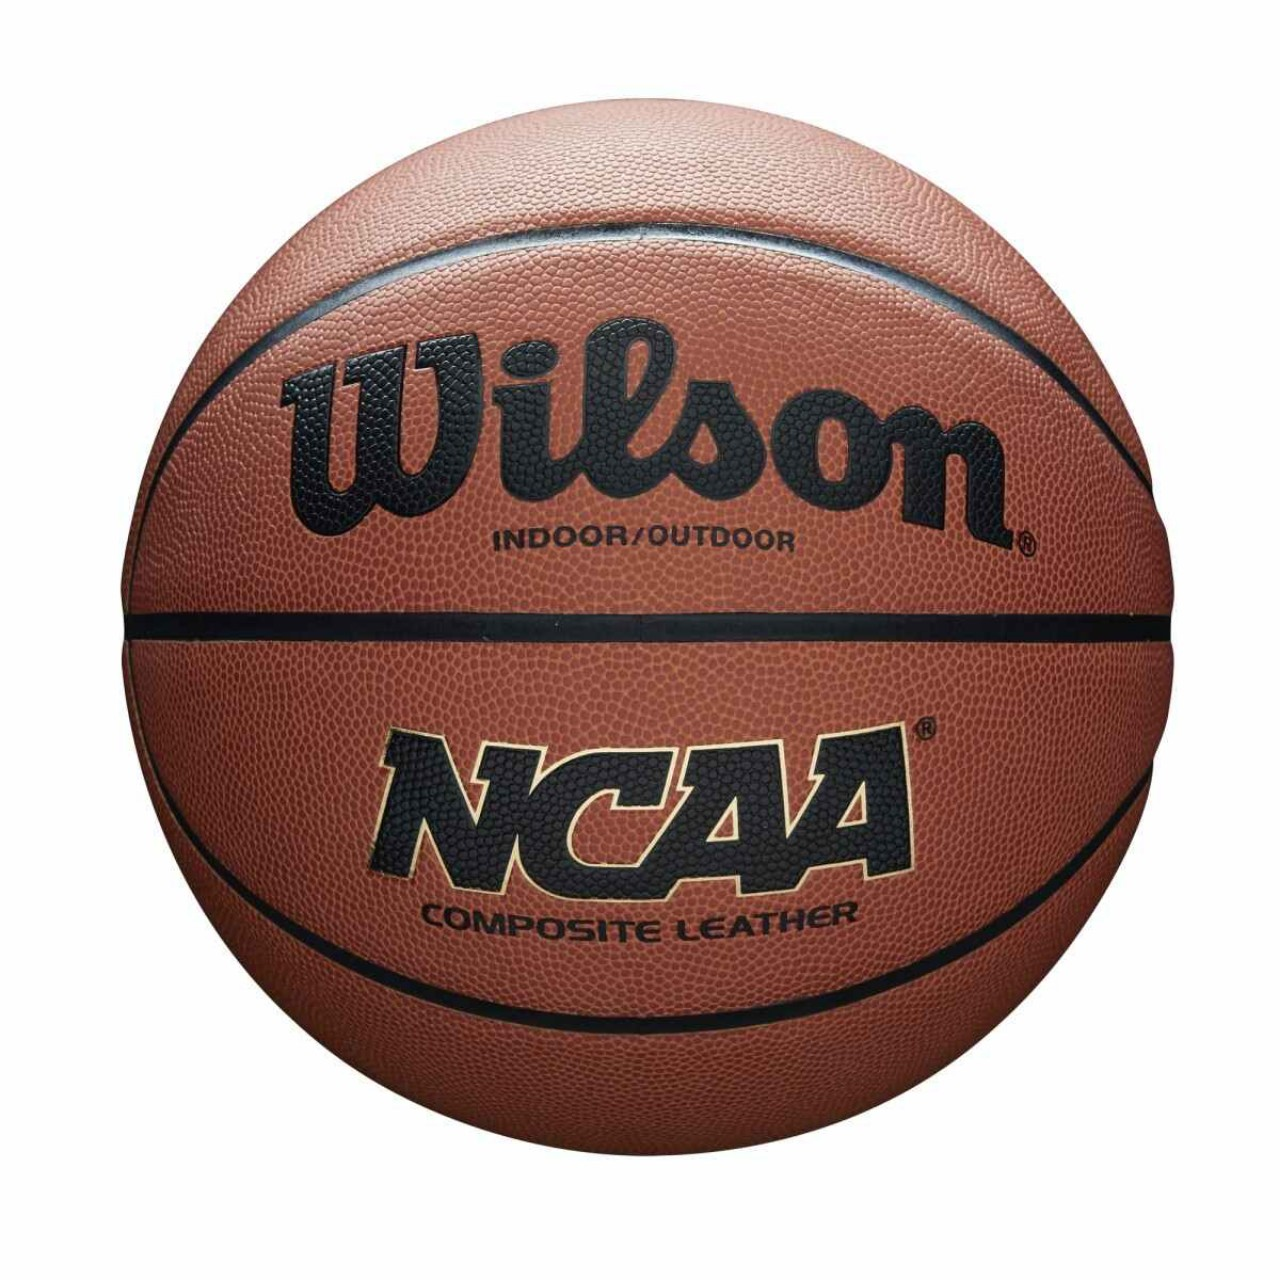 The Best Outdoor Basketball